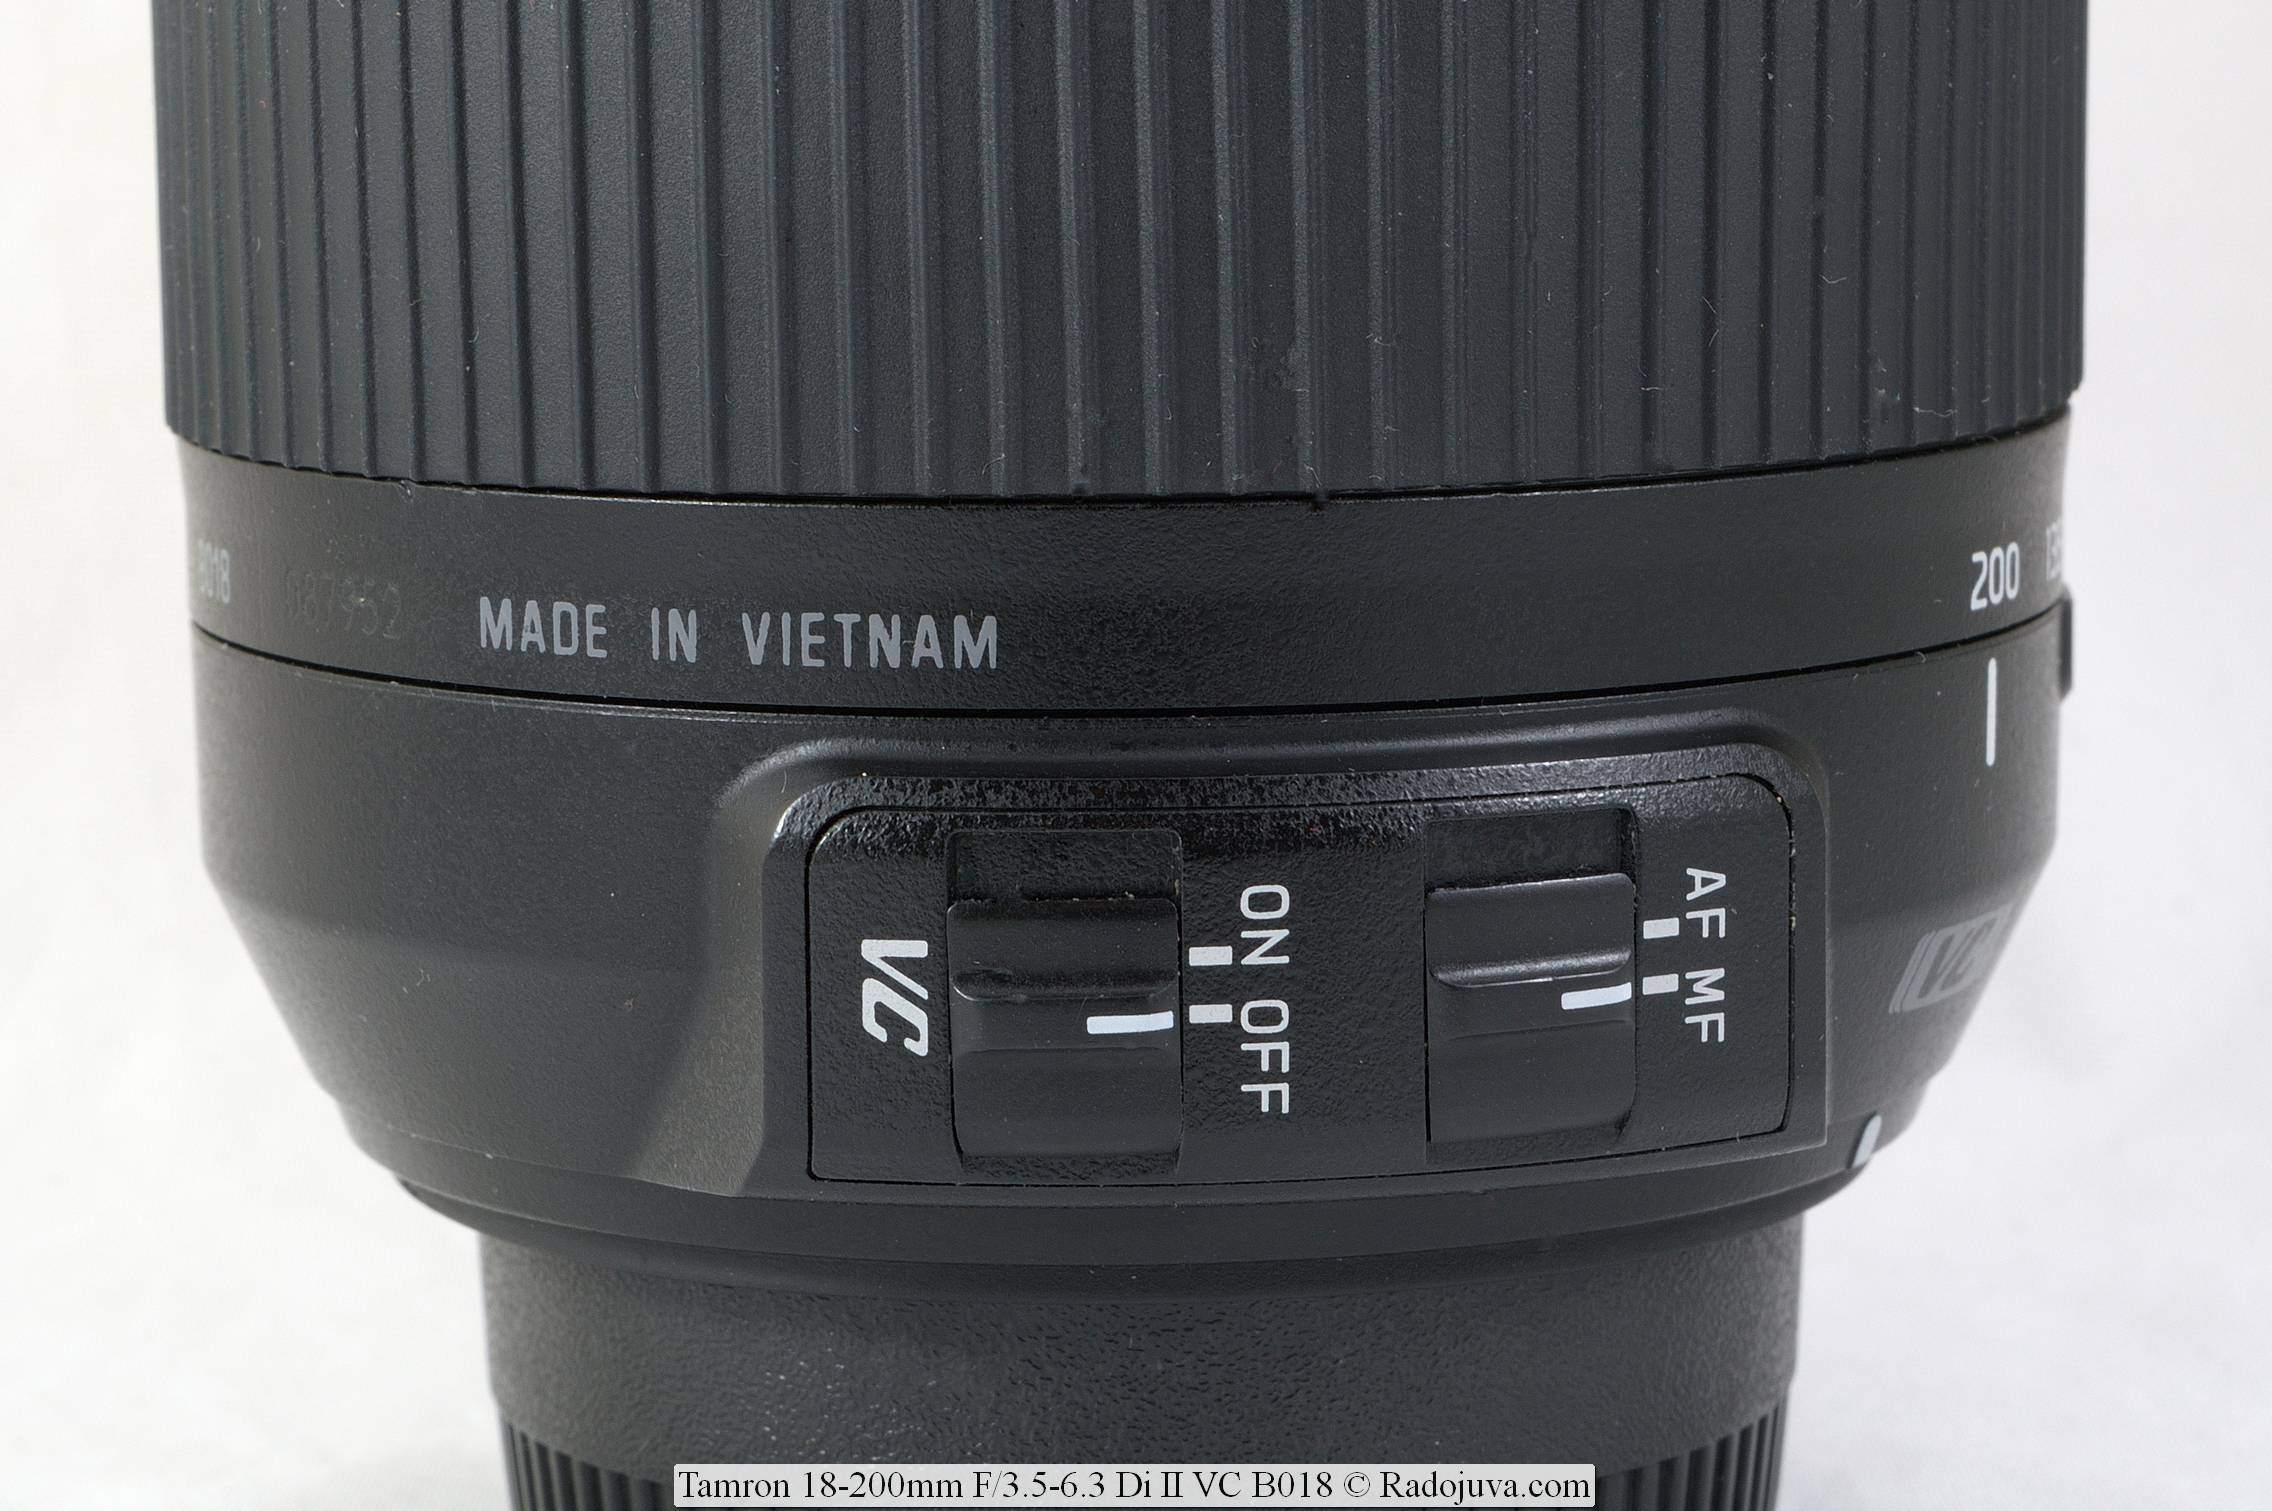 Tamron 18-200mm F/3.5-6.3 Di II VC Model B018